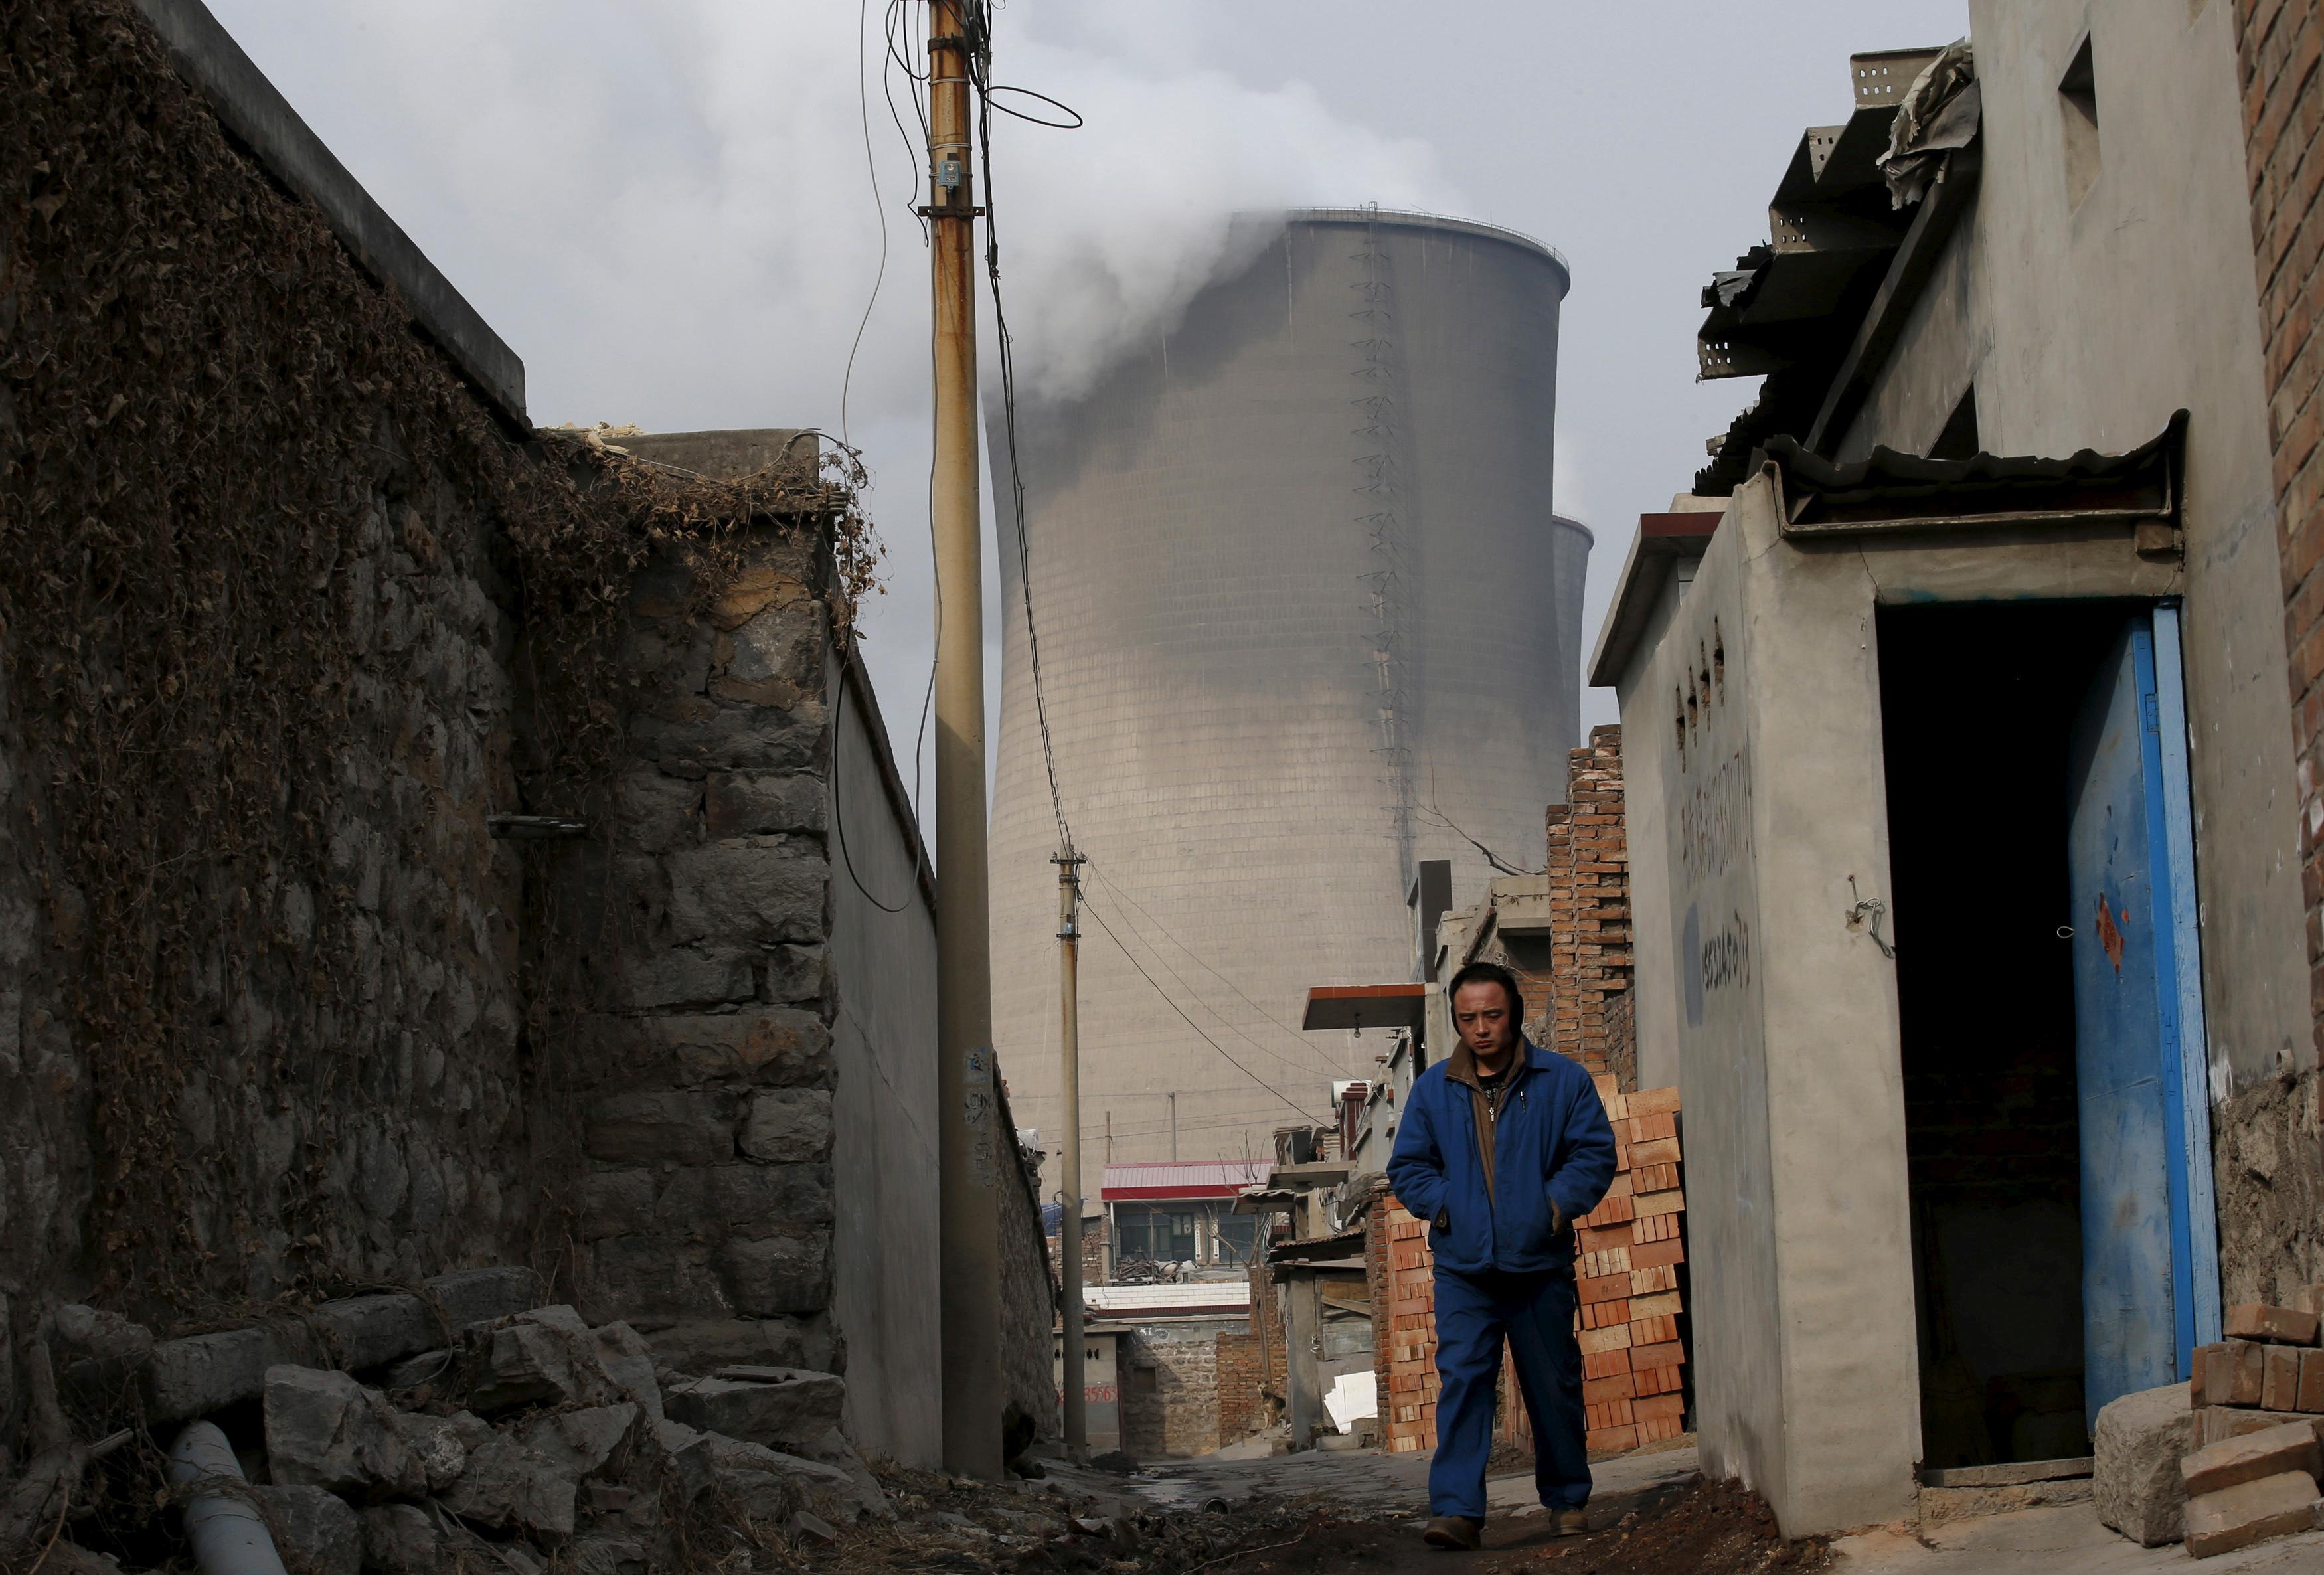 Despite climate pledges, China struggles to break coal habit